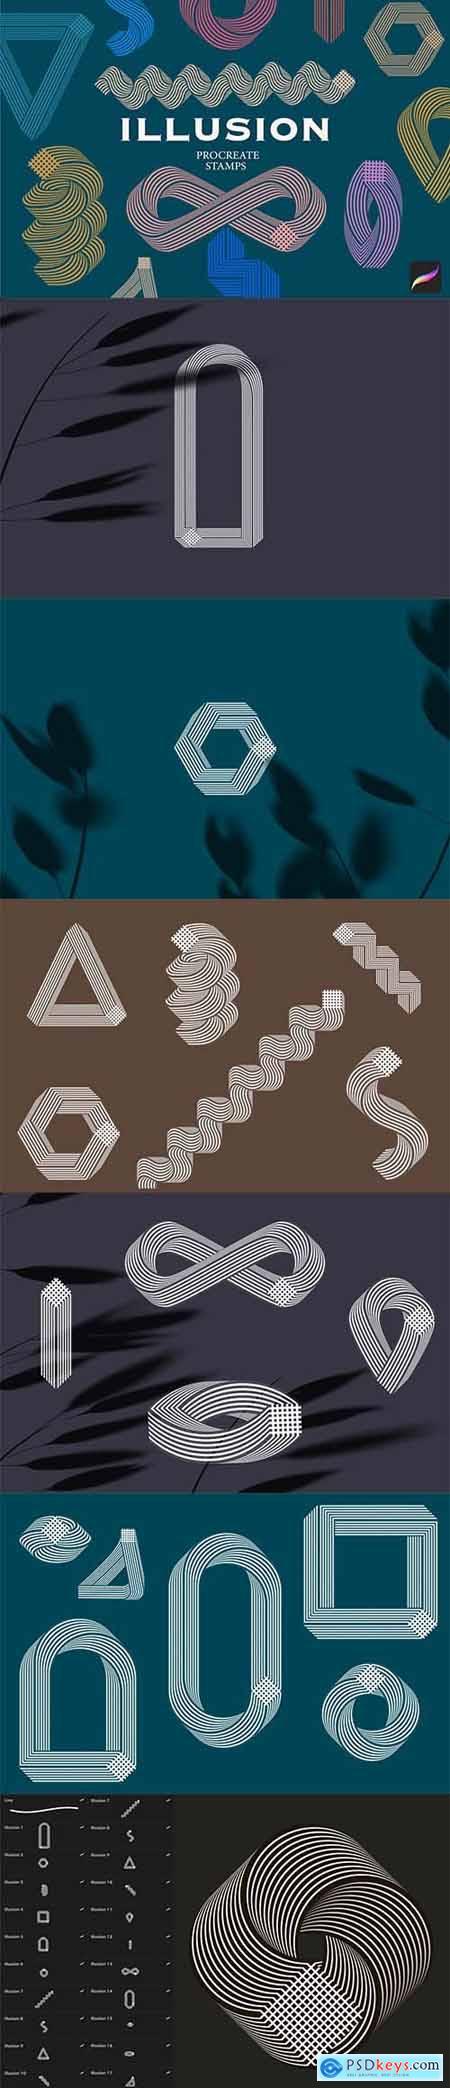 Illusion Procreate stamps 5748239